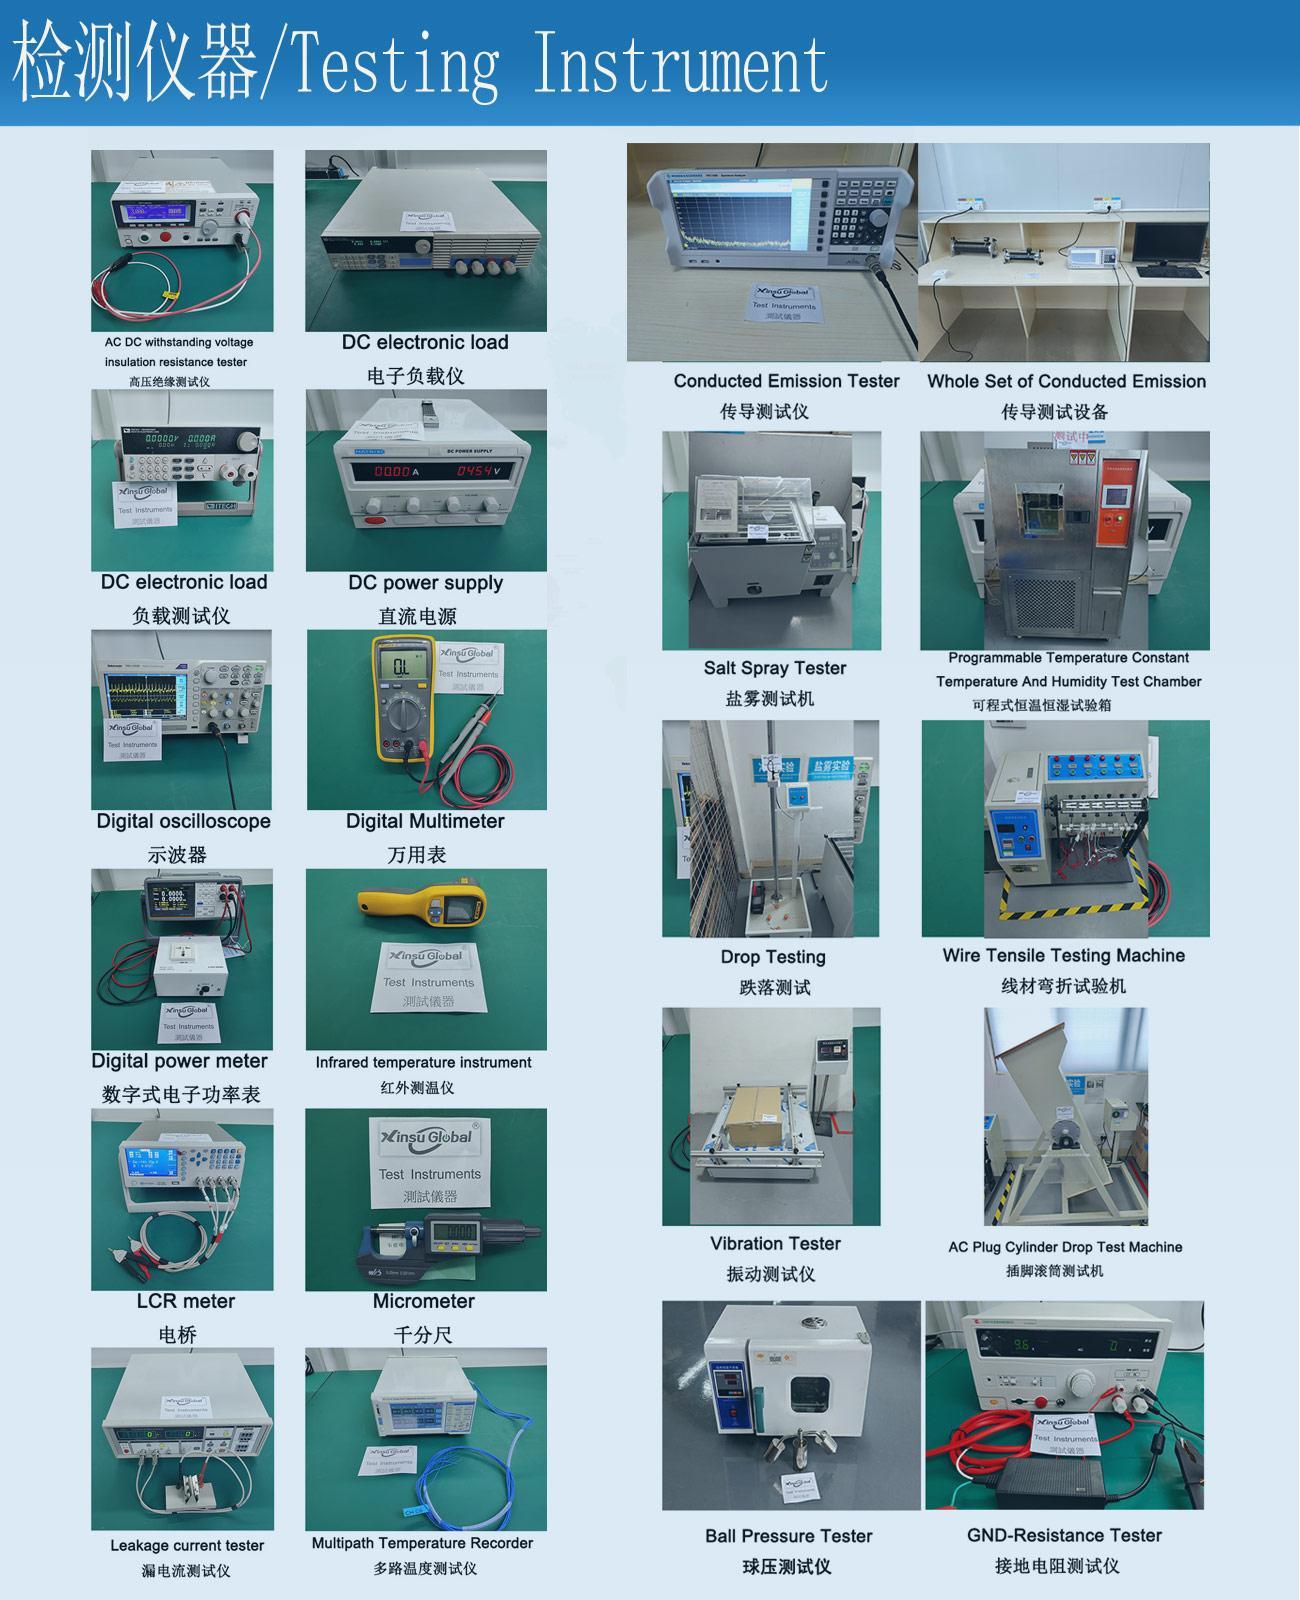 14.6V1A 铁锂电池充电器 14.6V充电器 ROHS认证充电器 6